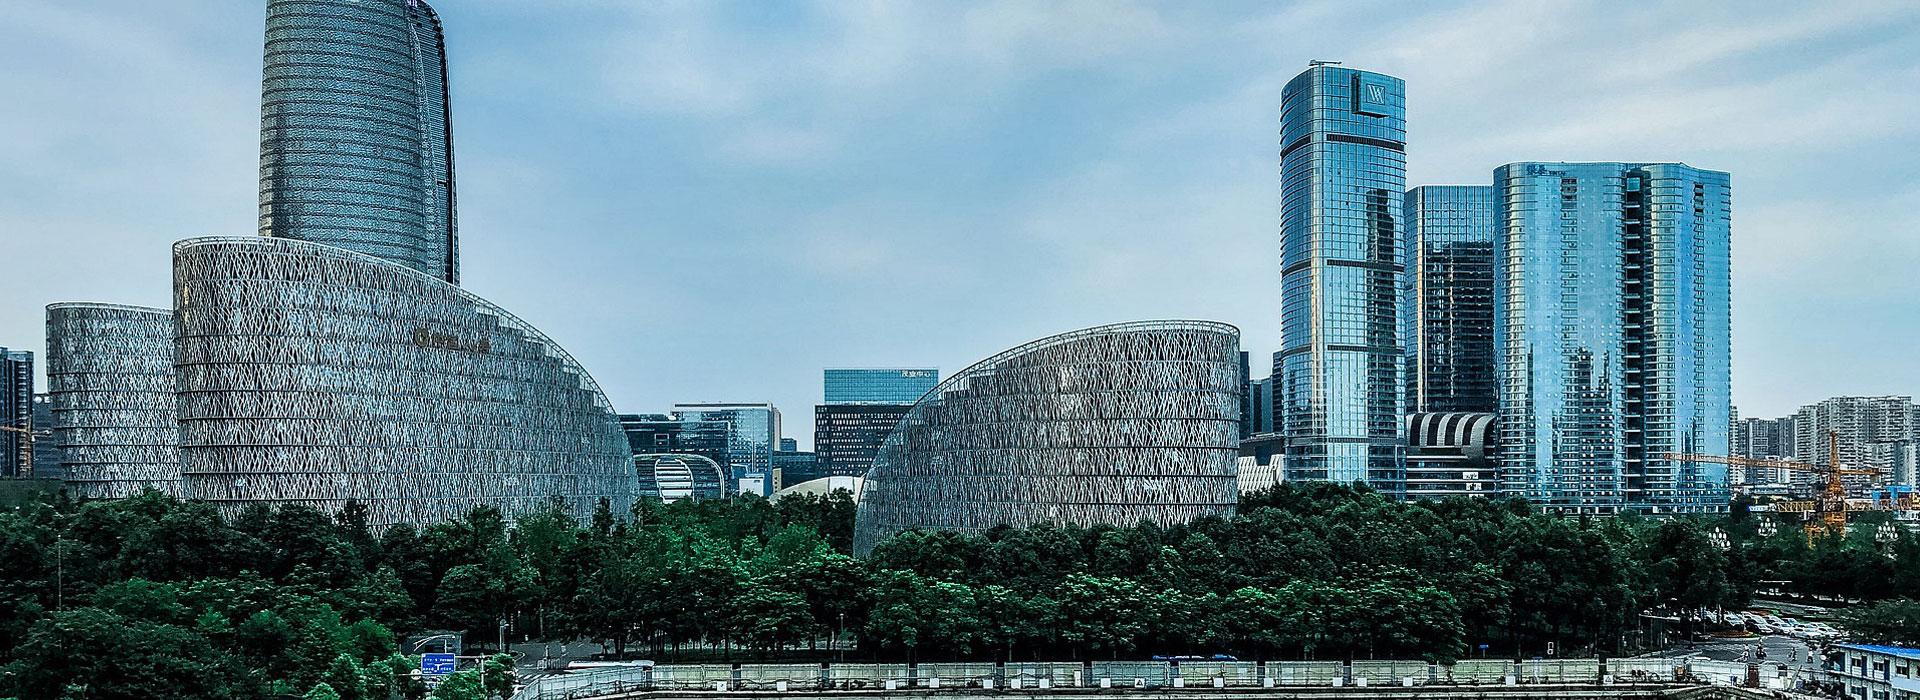 4D3N Experience Chengdu